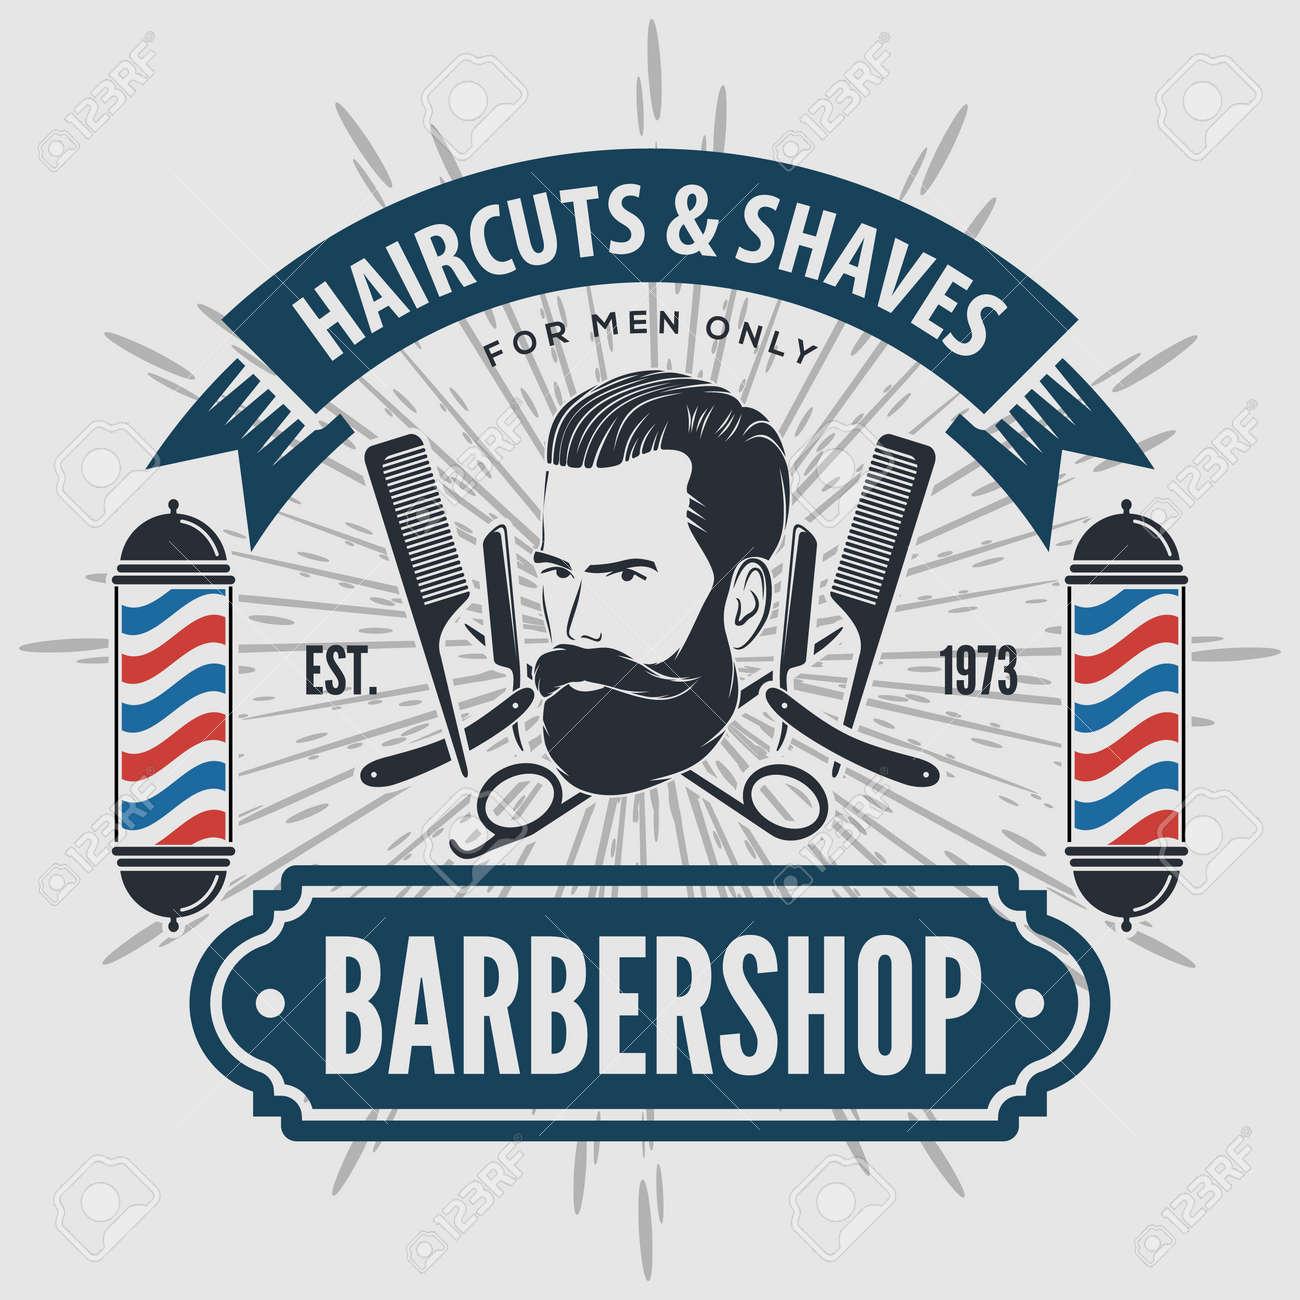 Barbershop design concept with barber pole - 169447756